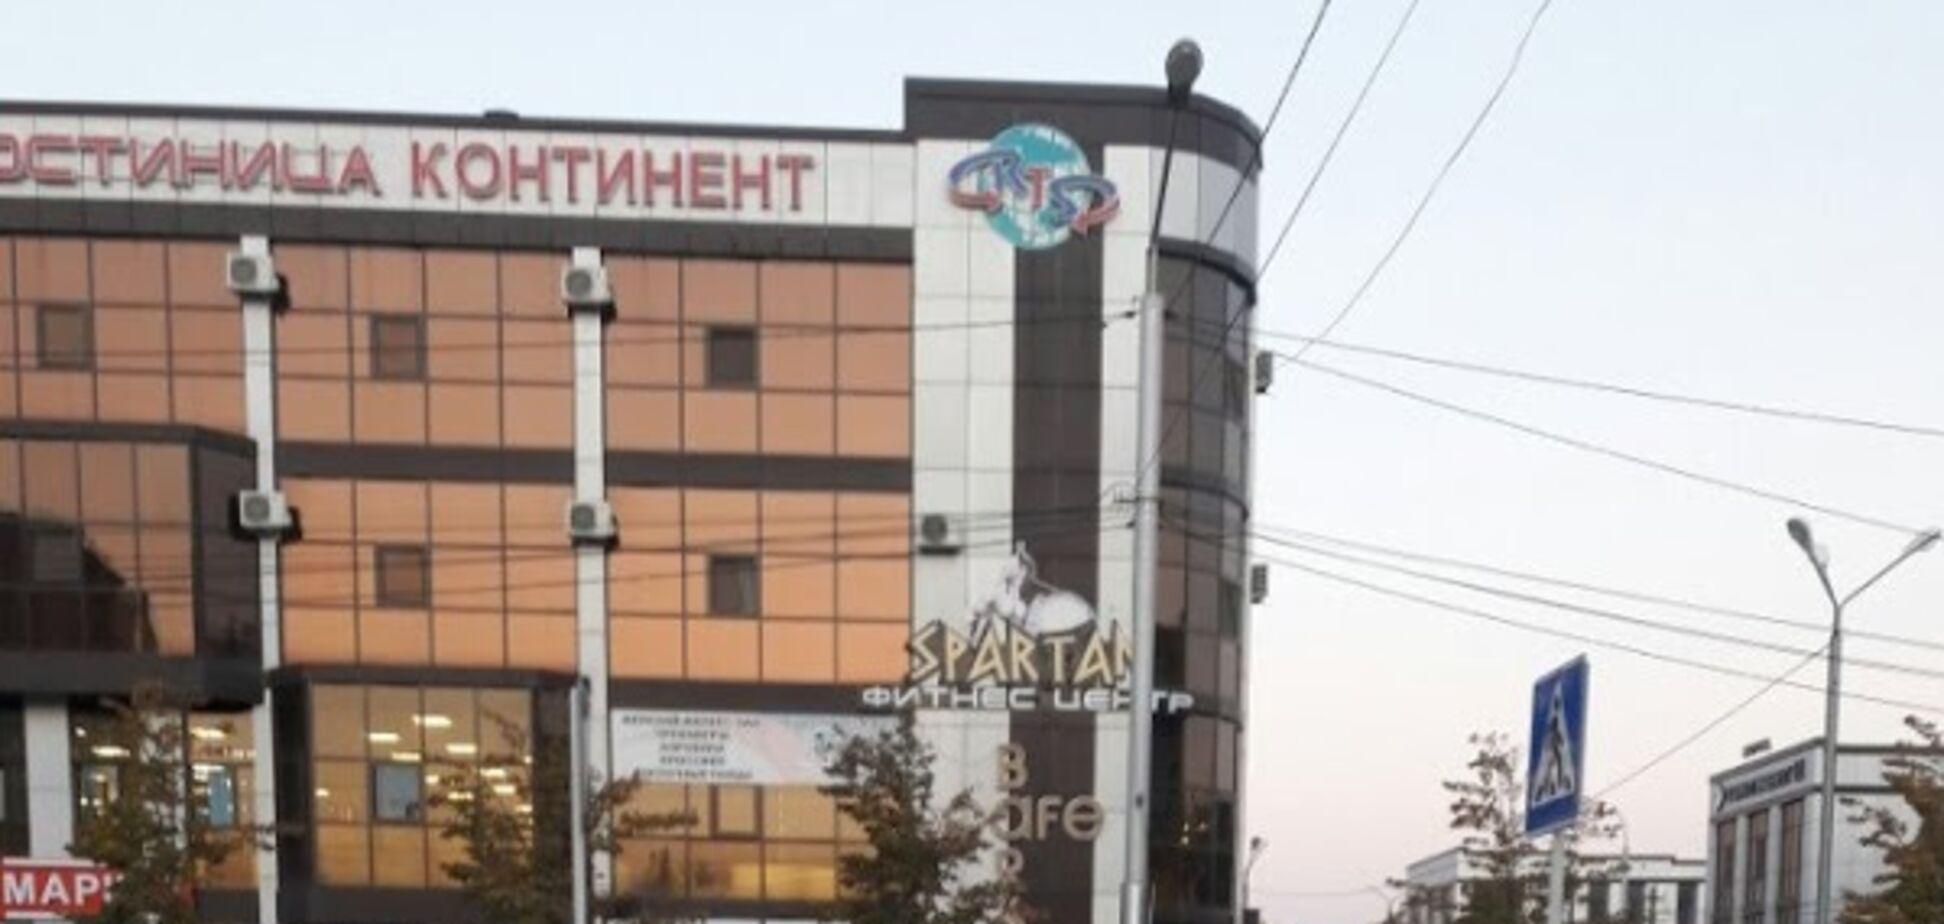 Избили женщин и сняли на камеру: в Чечне напали на известных российских адвоката и журналистку